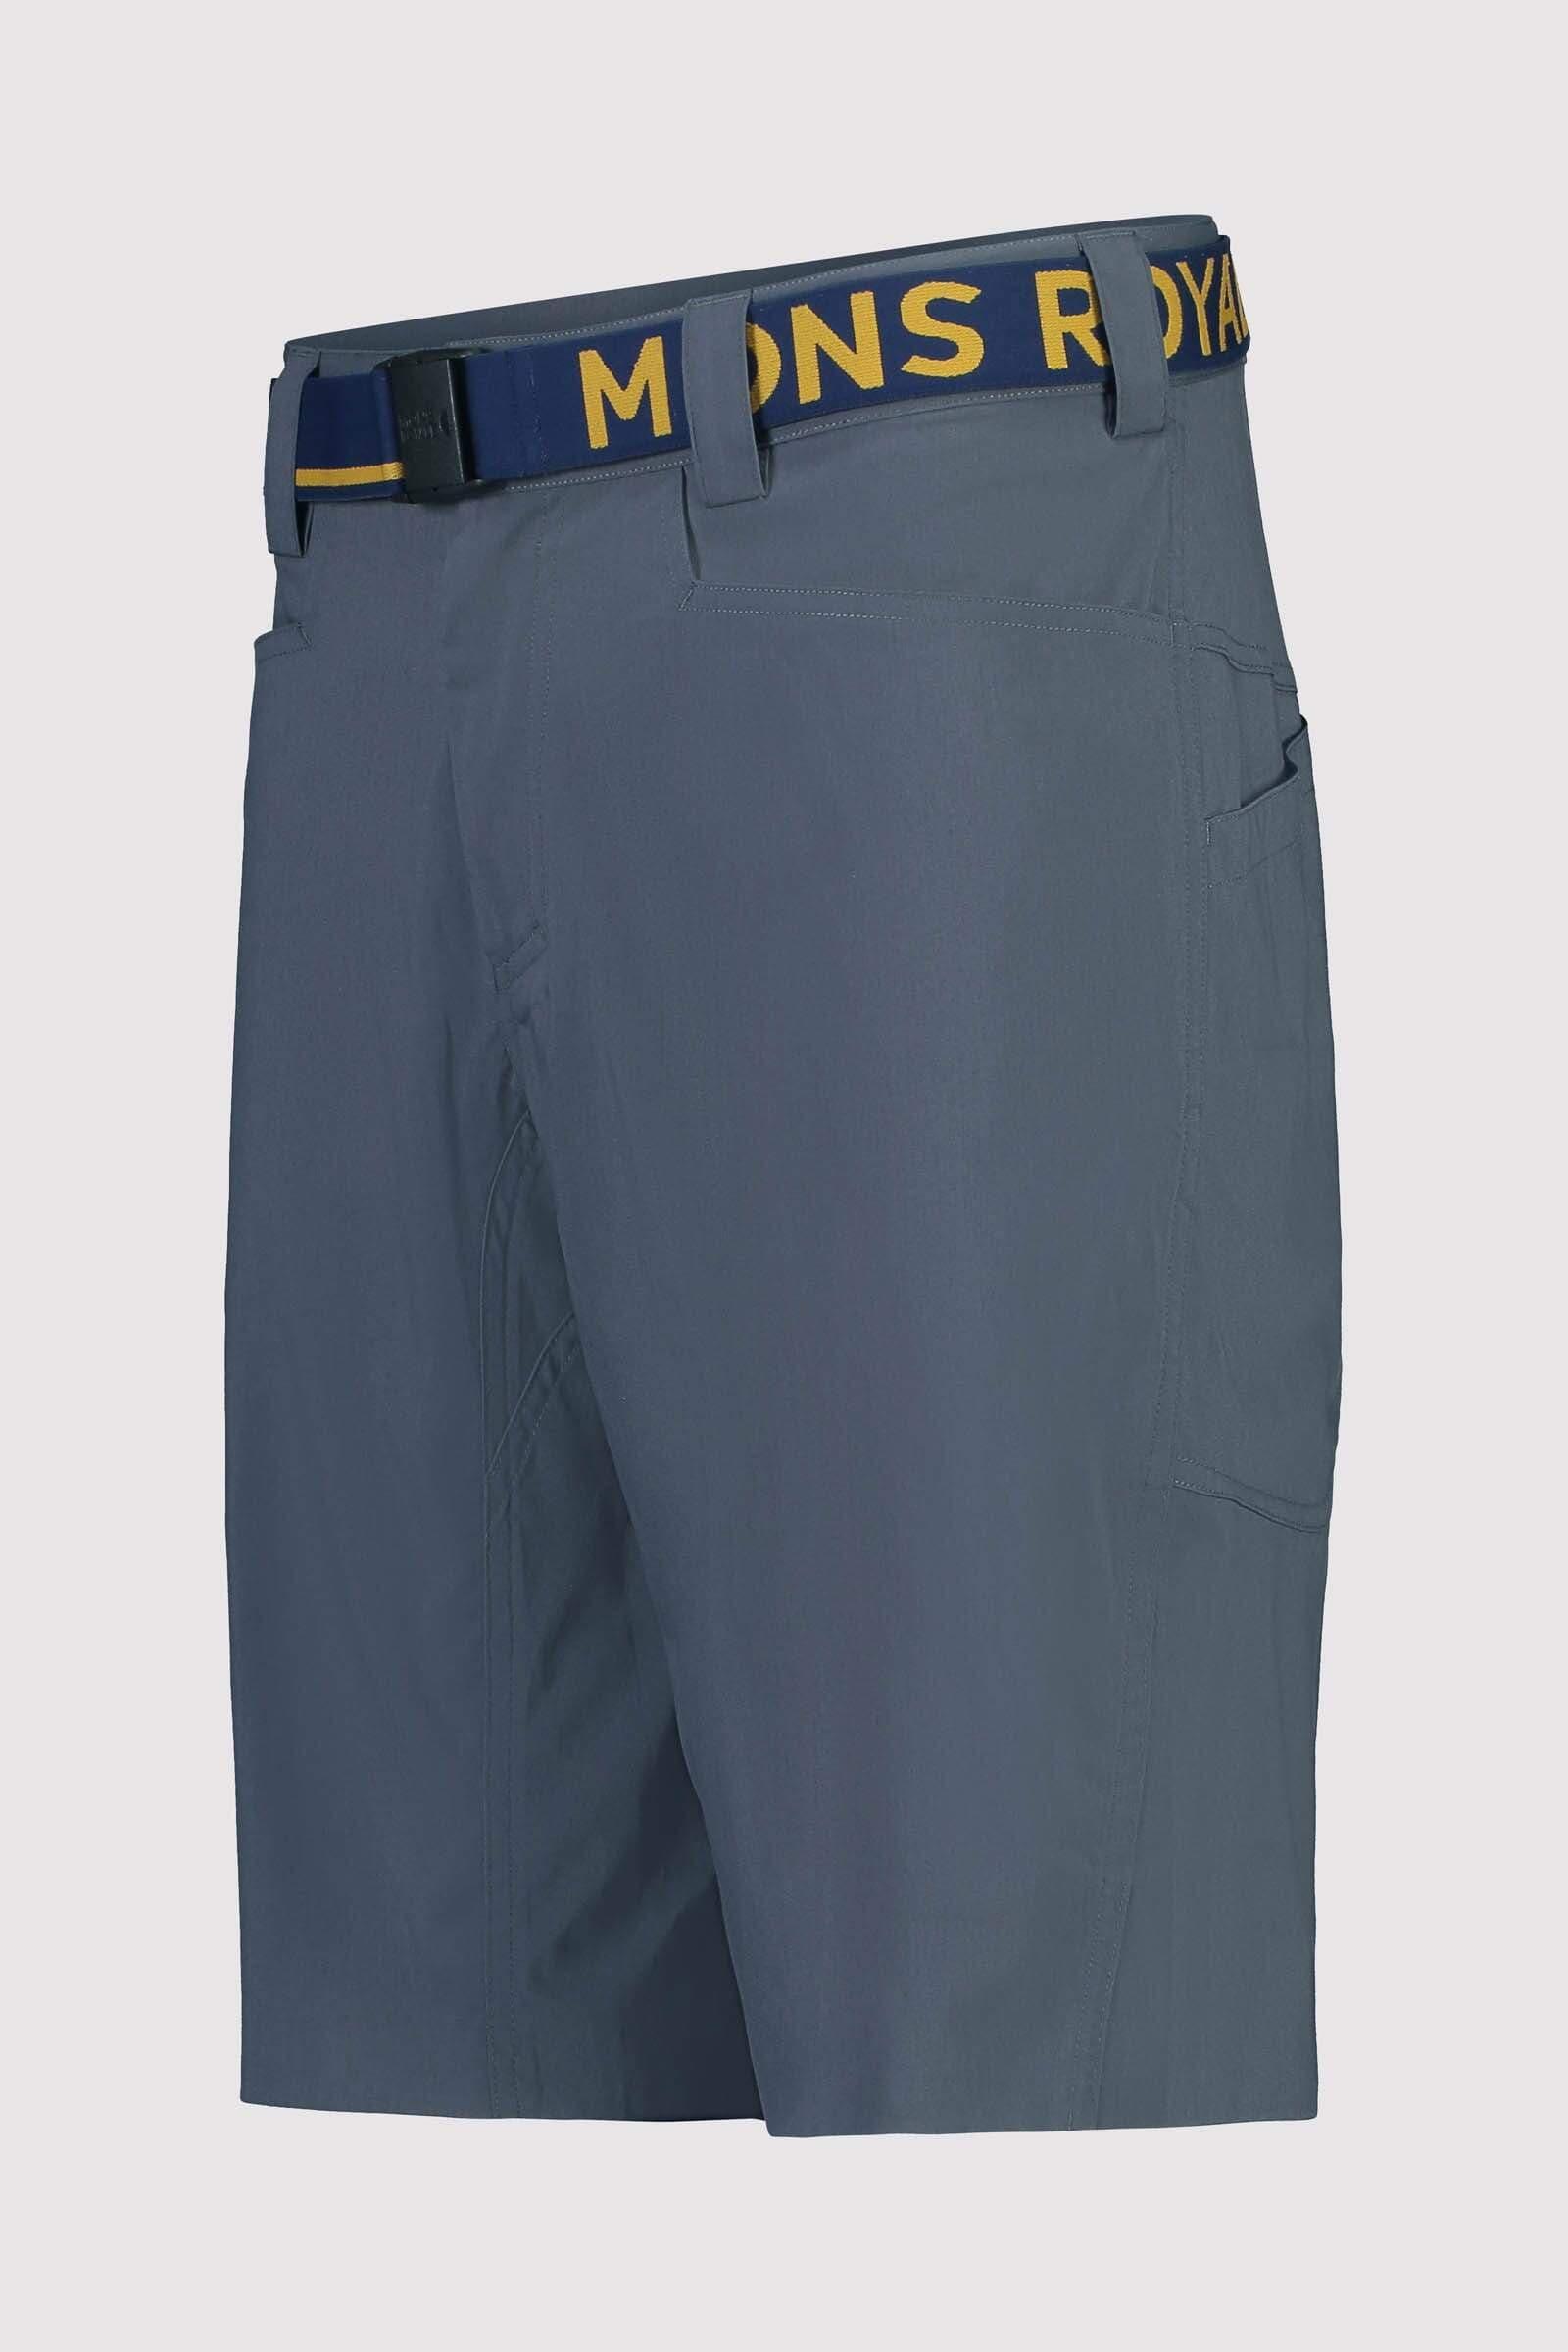 Mons Royale N. Shorts M's